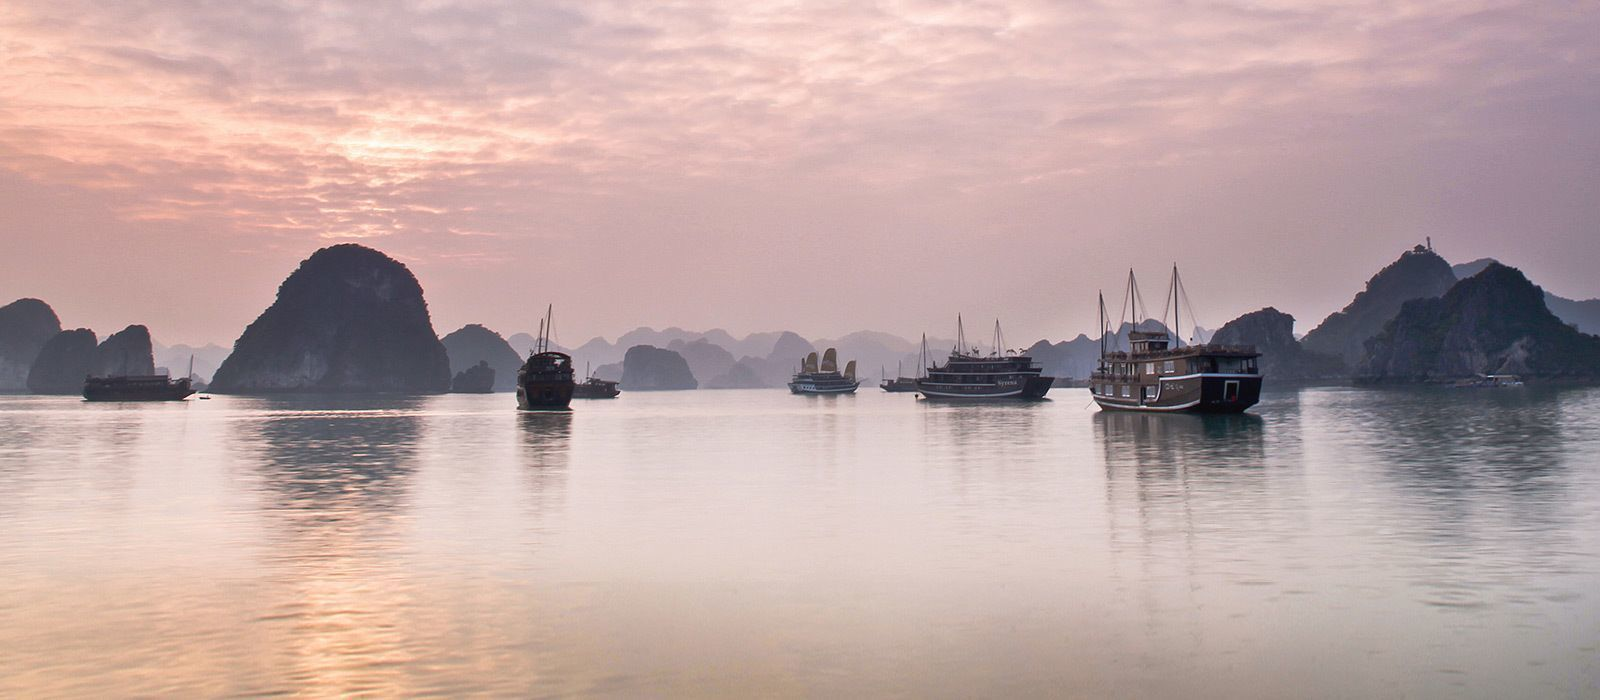 Rundreise Vietnam Kambodscha – Mekong & mehr Urlaub 2